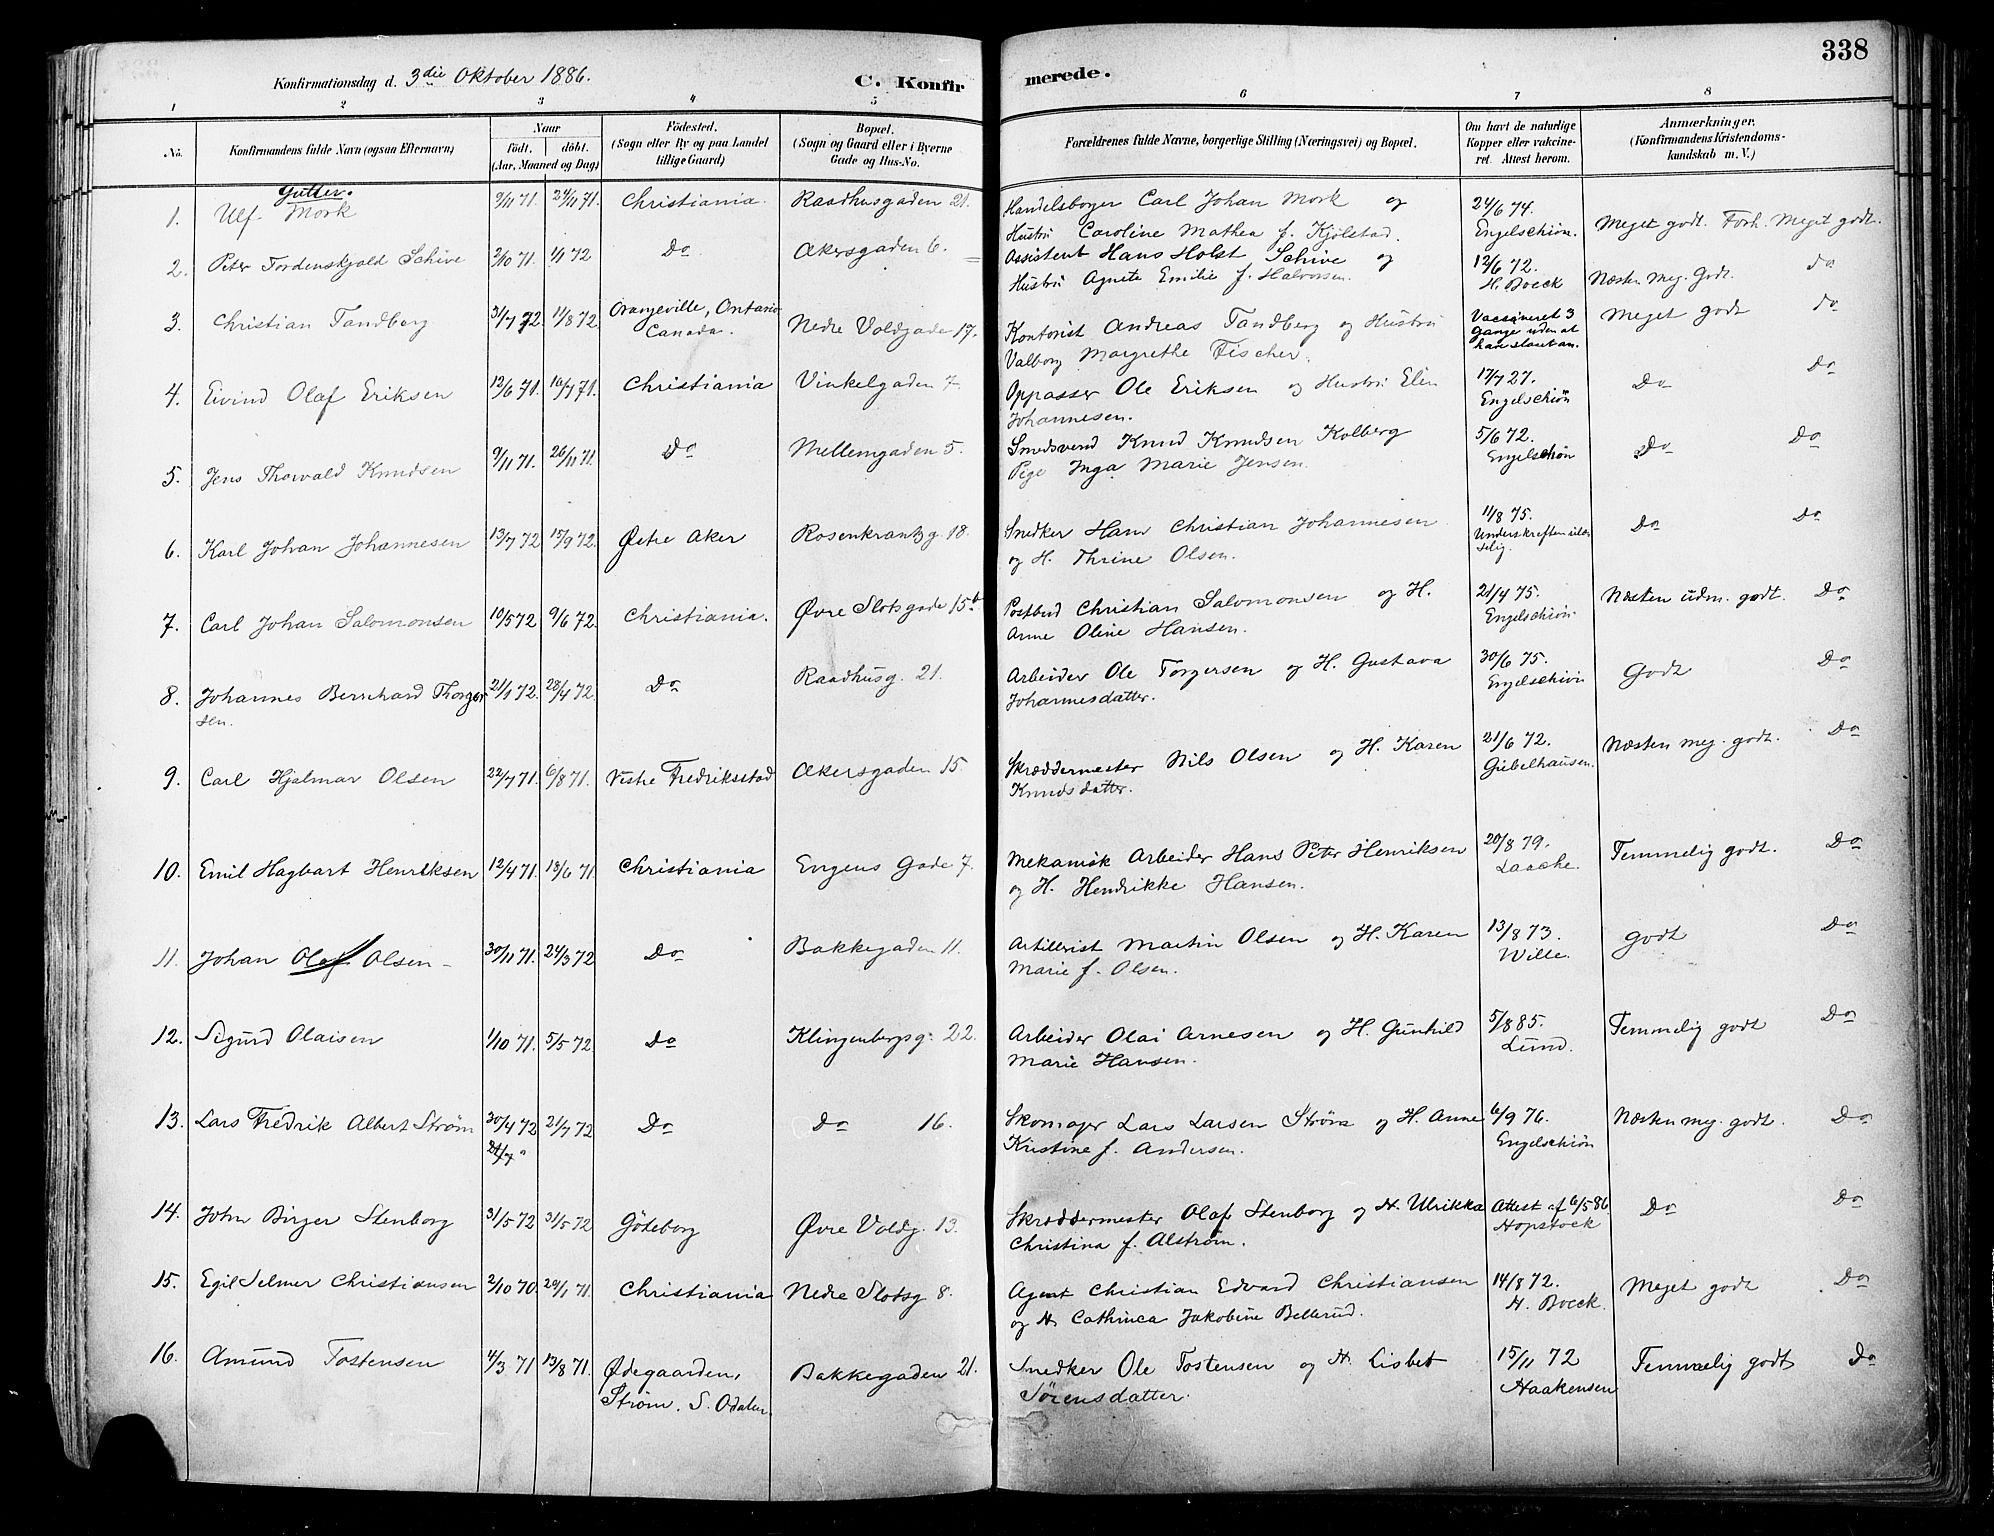 SAO, Johannes prestekontor Kirkebøker, F/Fa/L0003: Ministerialbok nr. 3, 1882-1896, s. 338